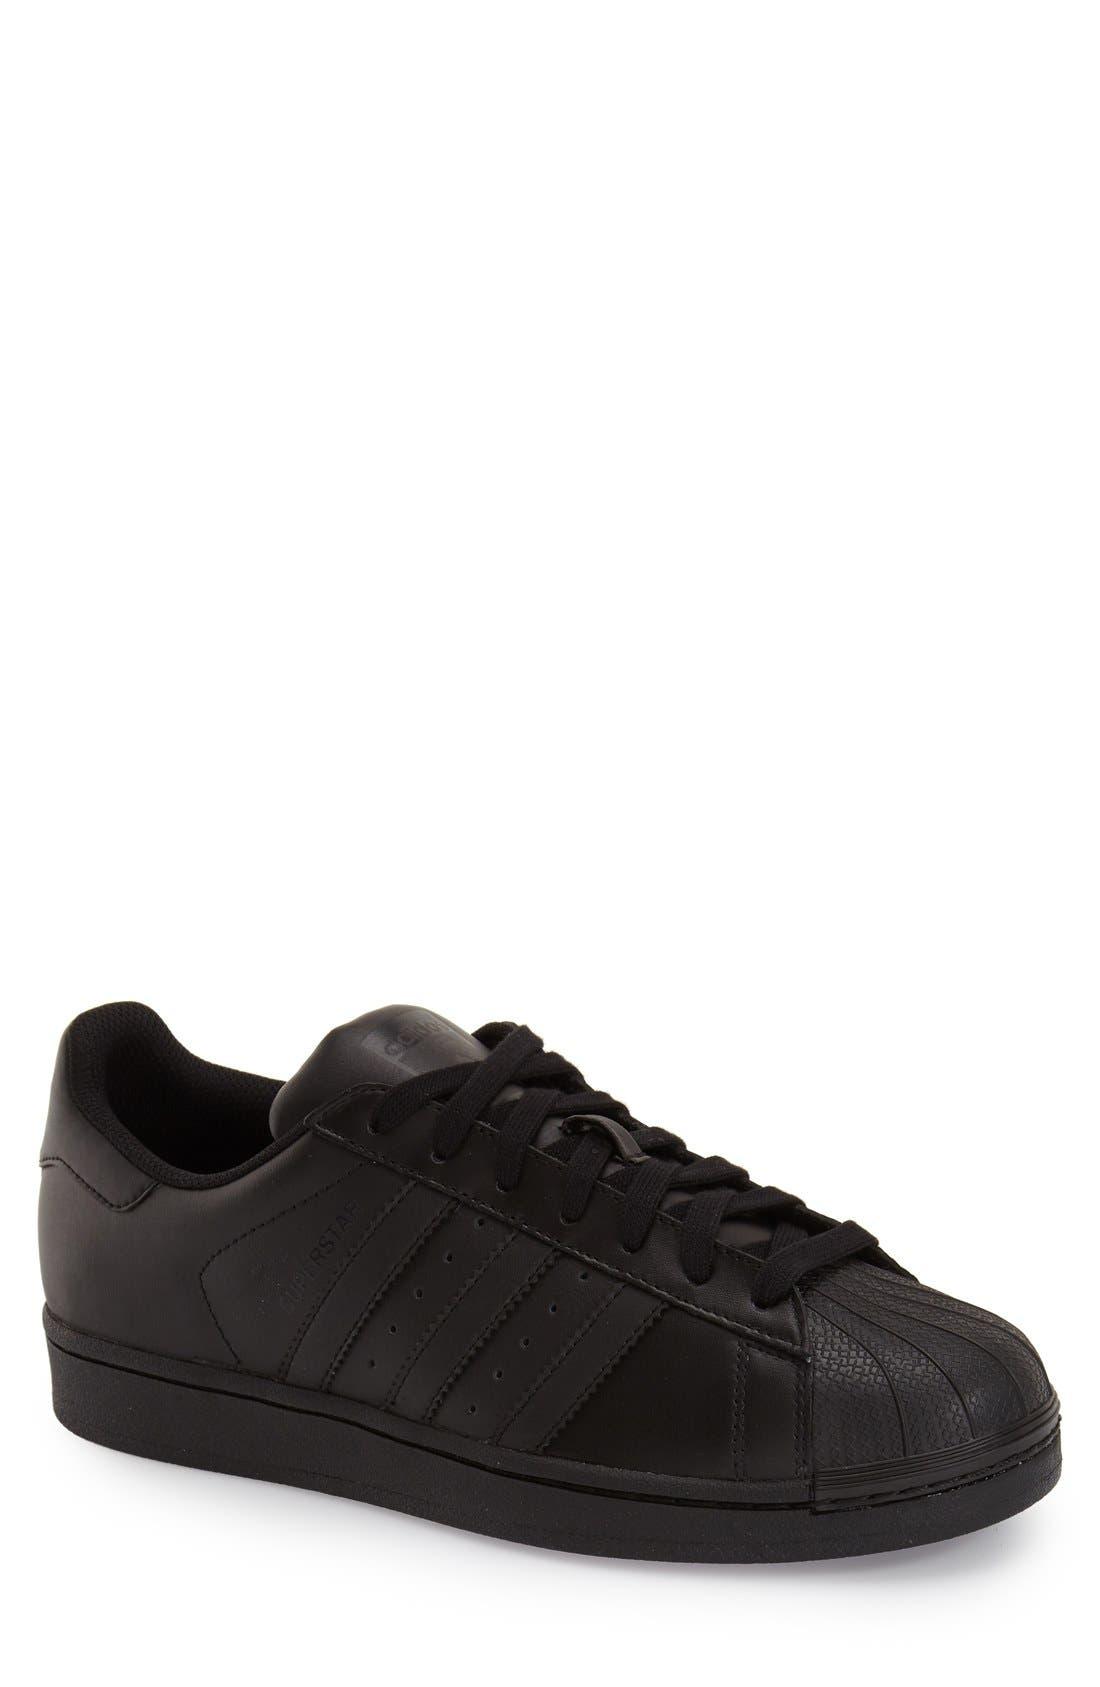 Alternate Image 1 Selected - adidas 'Superstar Foundation' Sneaker (Men) (Regular Retail Price: $79.95)